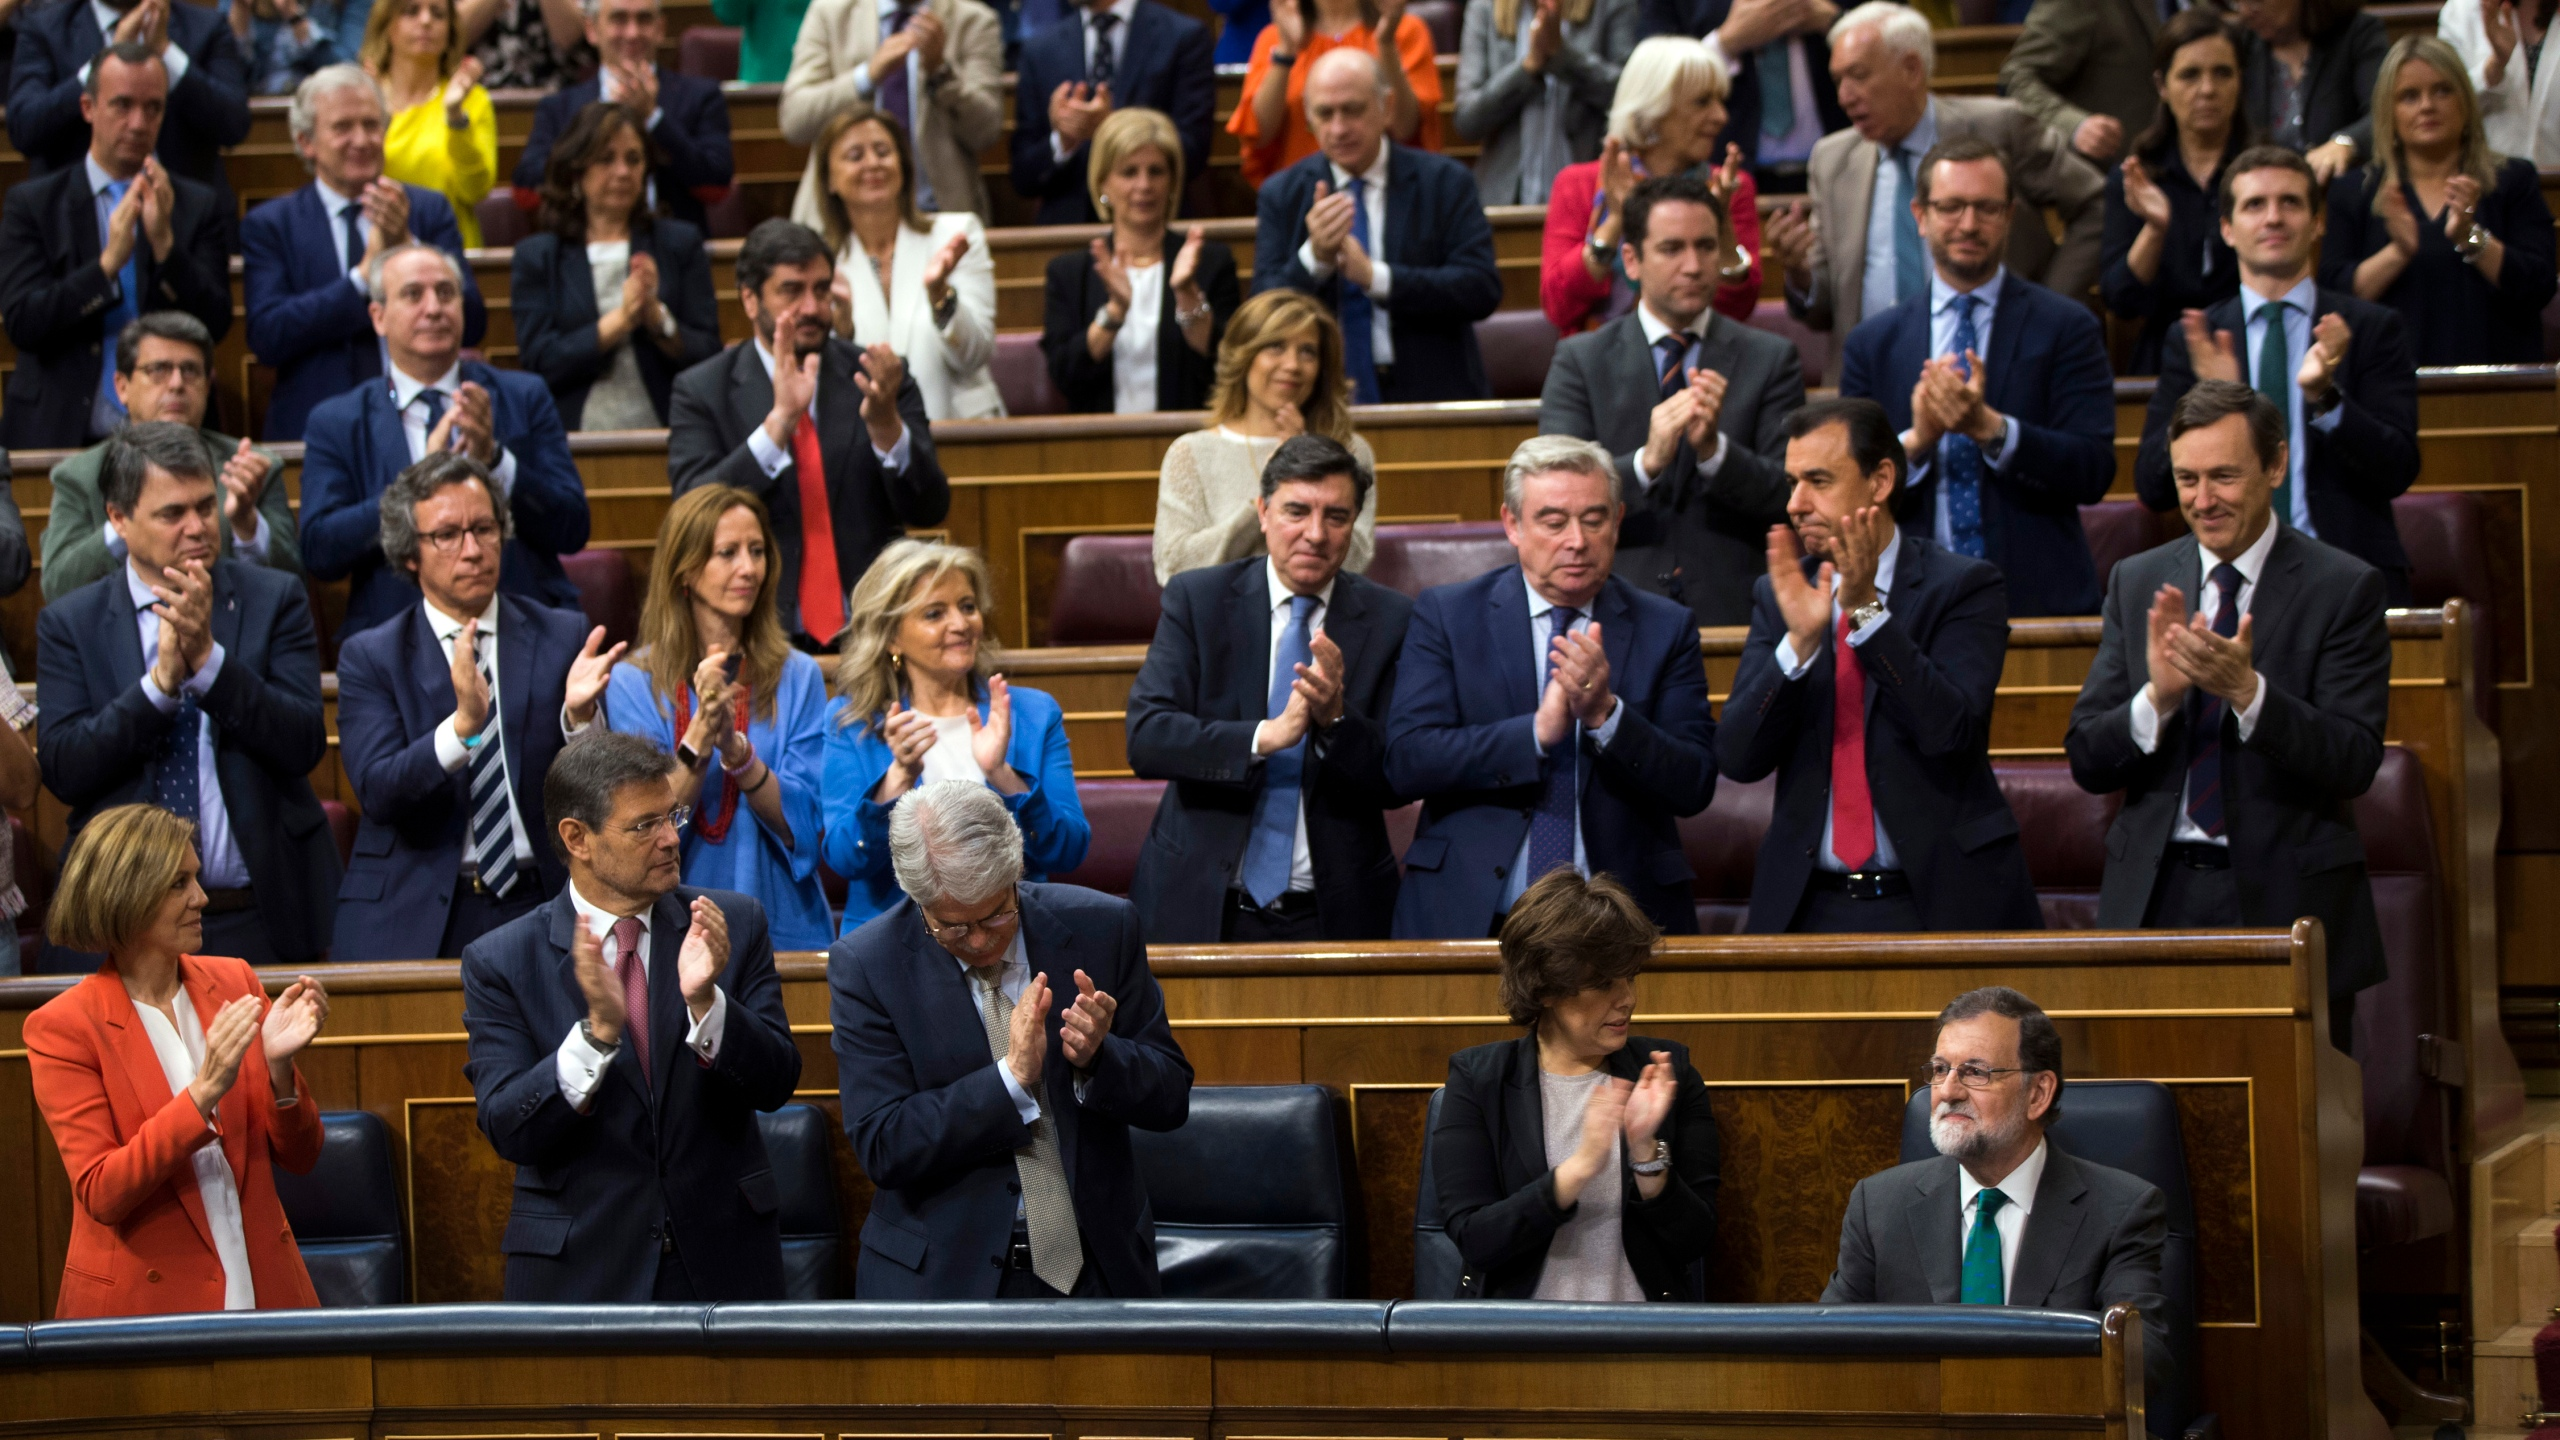 APTOPIX_Spain_Politics_22565-159532.jpg39384550